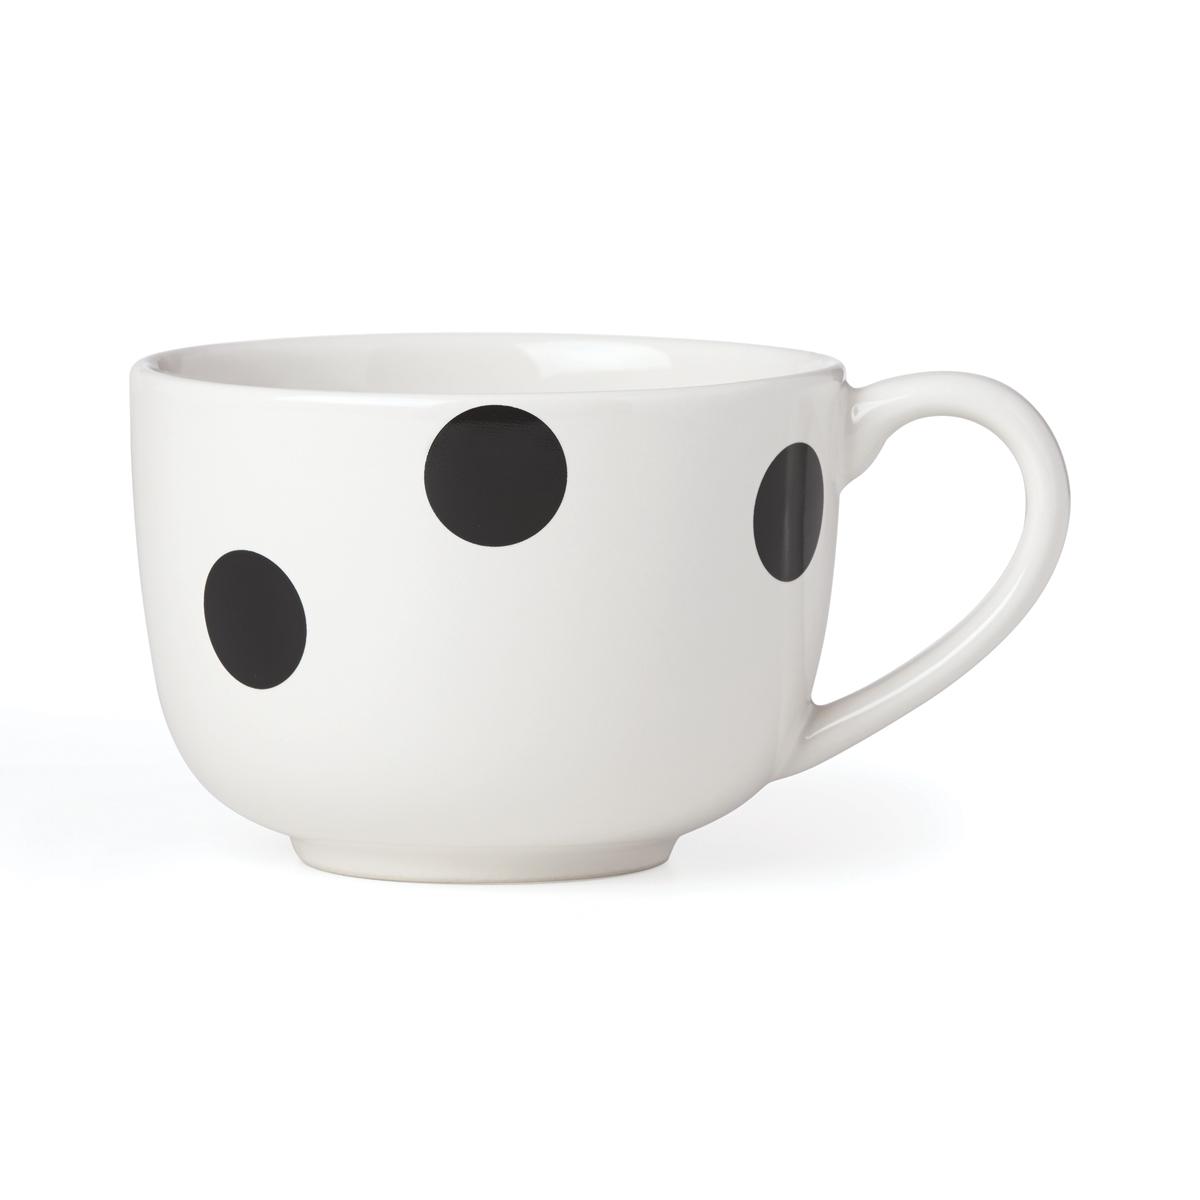 Kate Spade China by Lenox, Deco Dot Black Latte Mug, Single